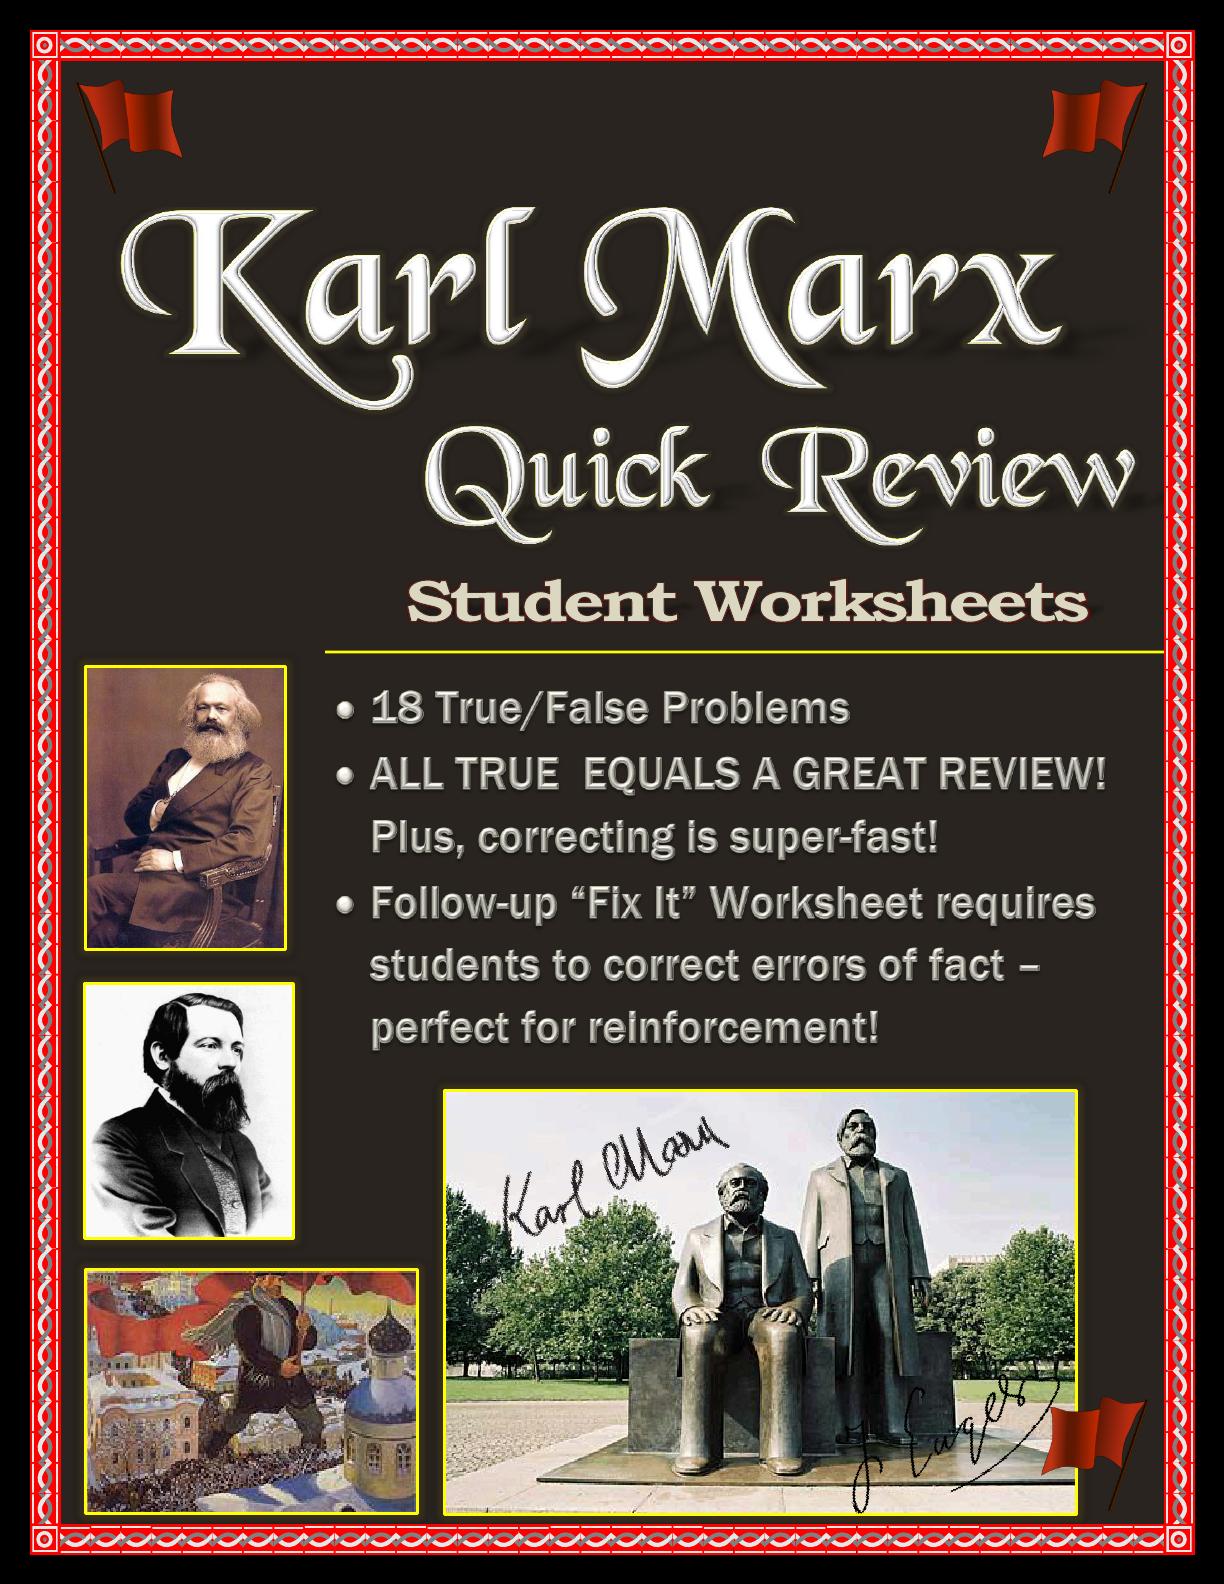 Karl Marx Worksheet Pack True False And Fix It